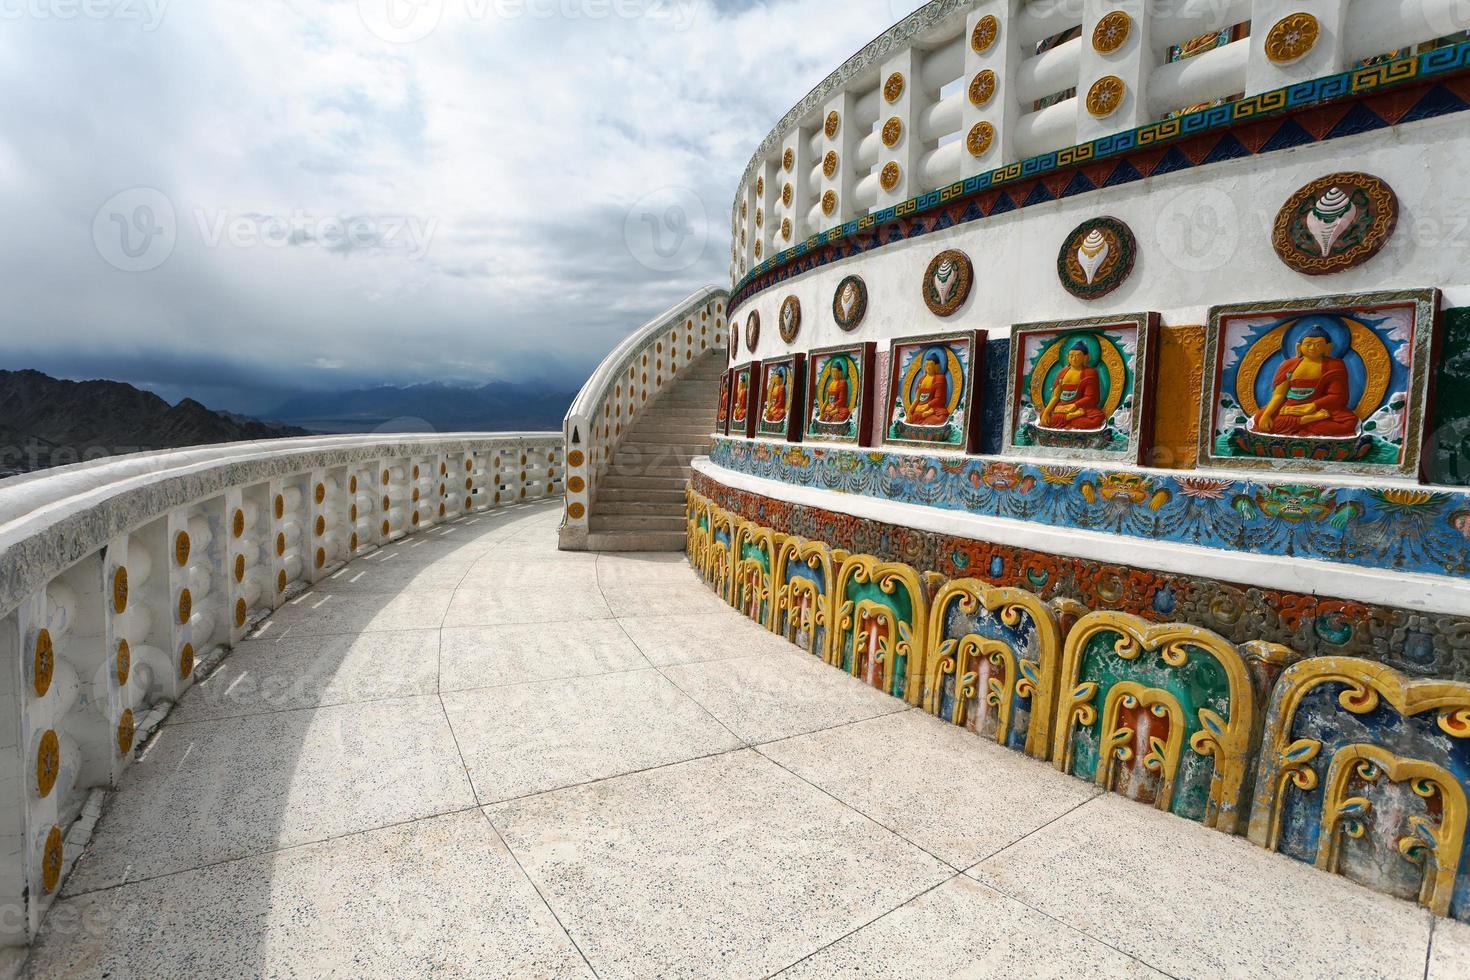 hoge shanti stupa in de buurt van leh - ladakh - india foto